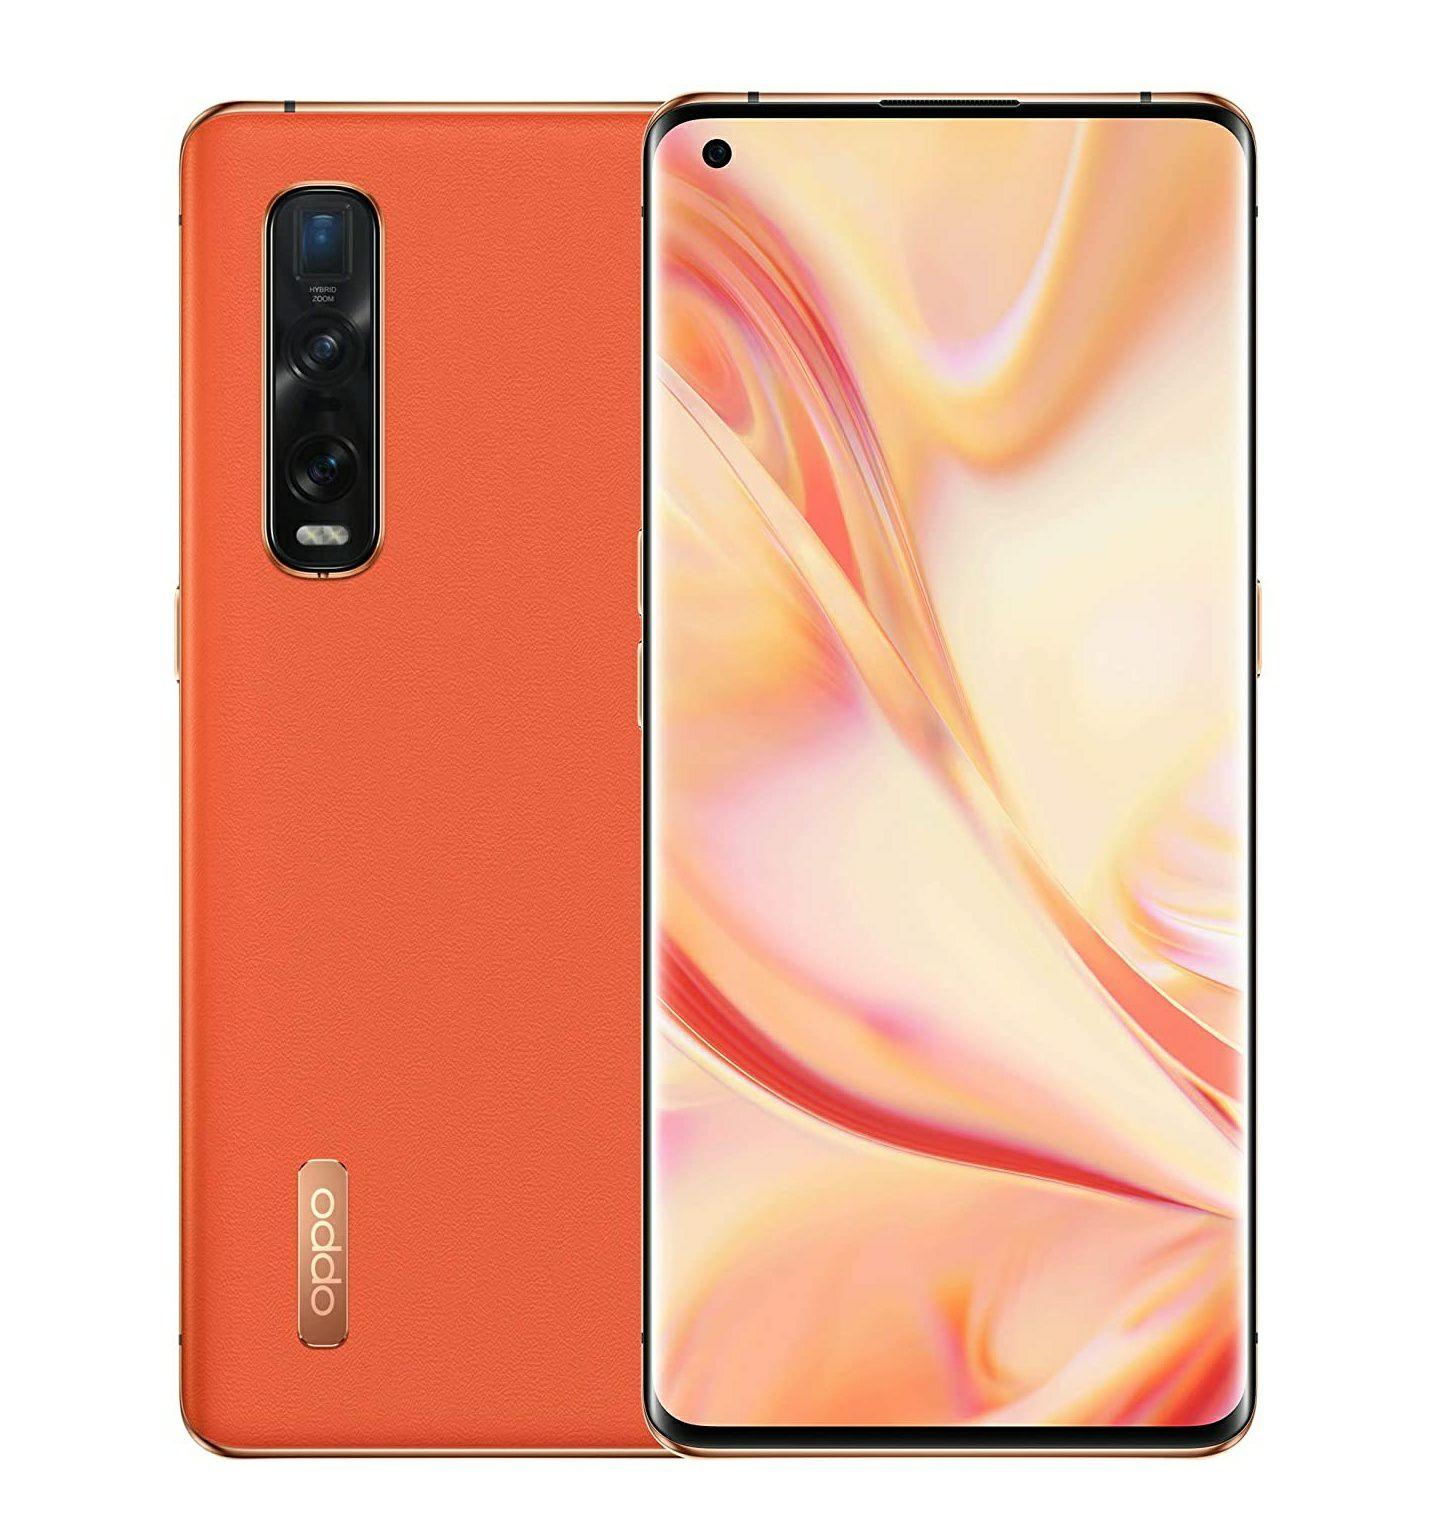 OPPO Find X2 Pro 5G 512GB 12GB Snapdragon 865 Smartphone - £799.99 @ Amazon